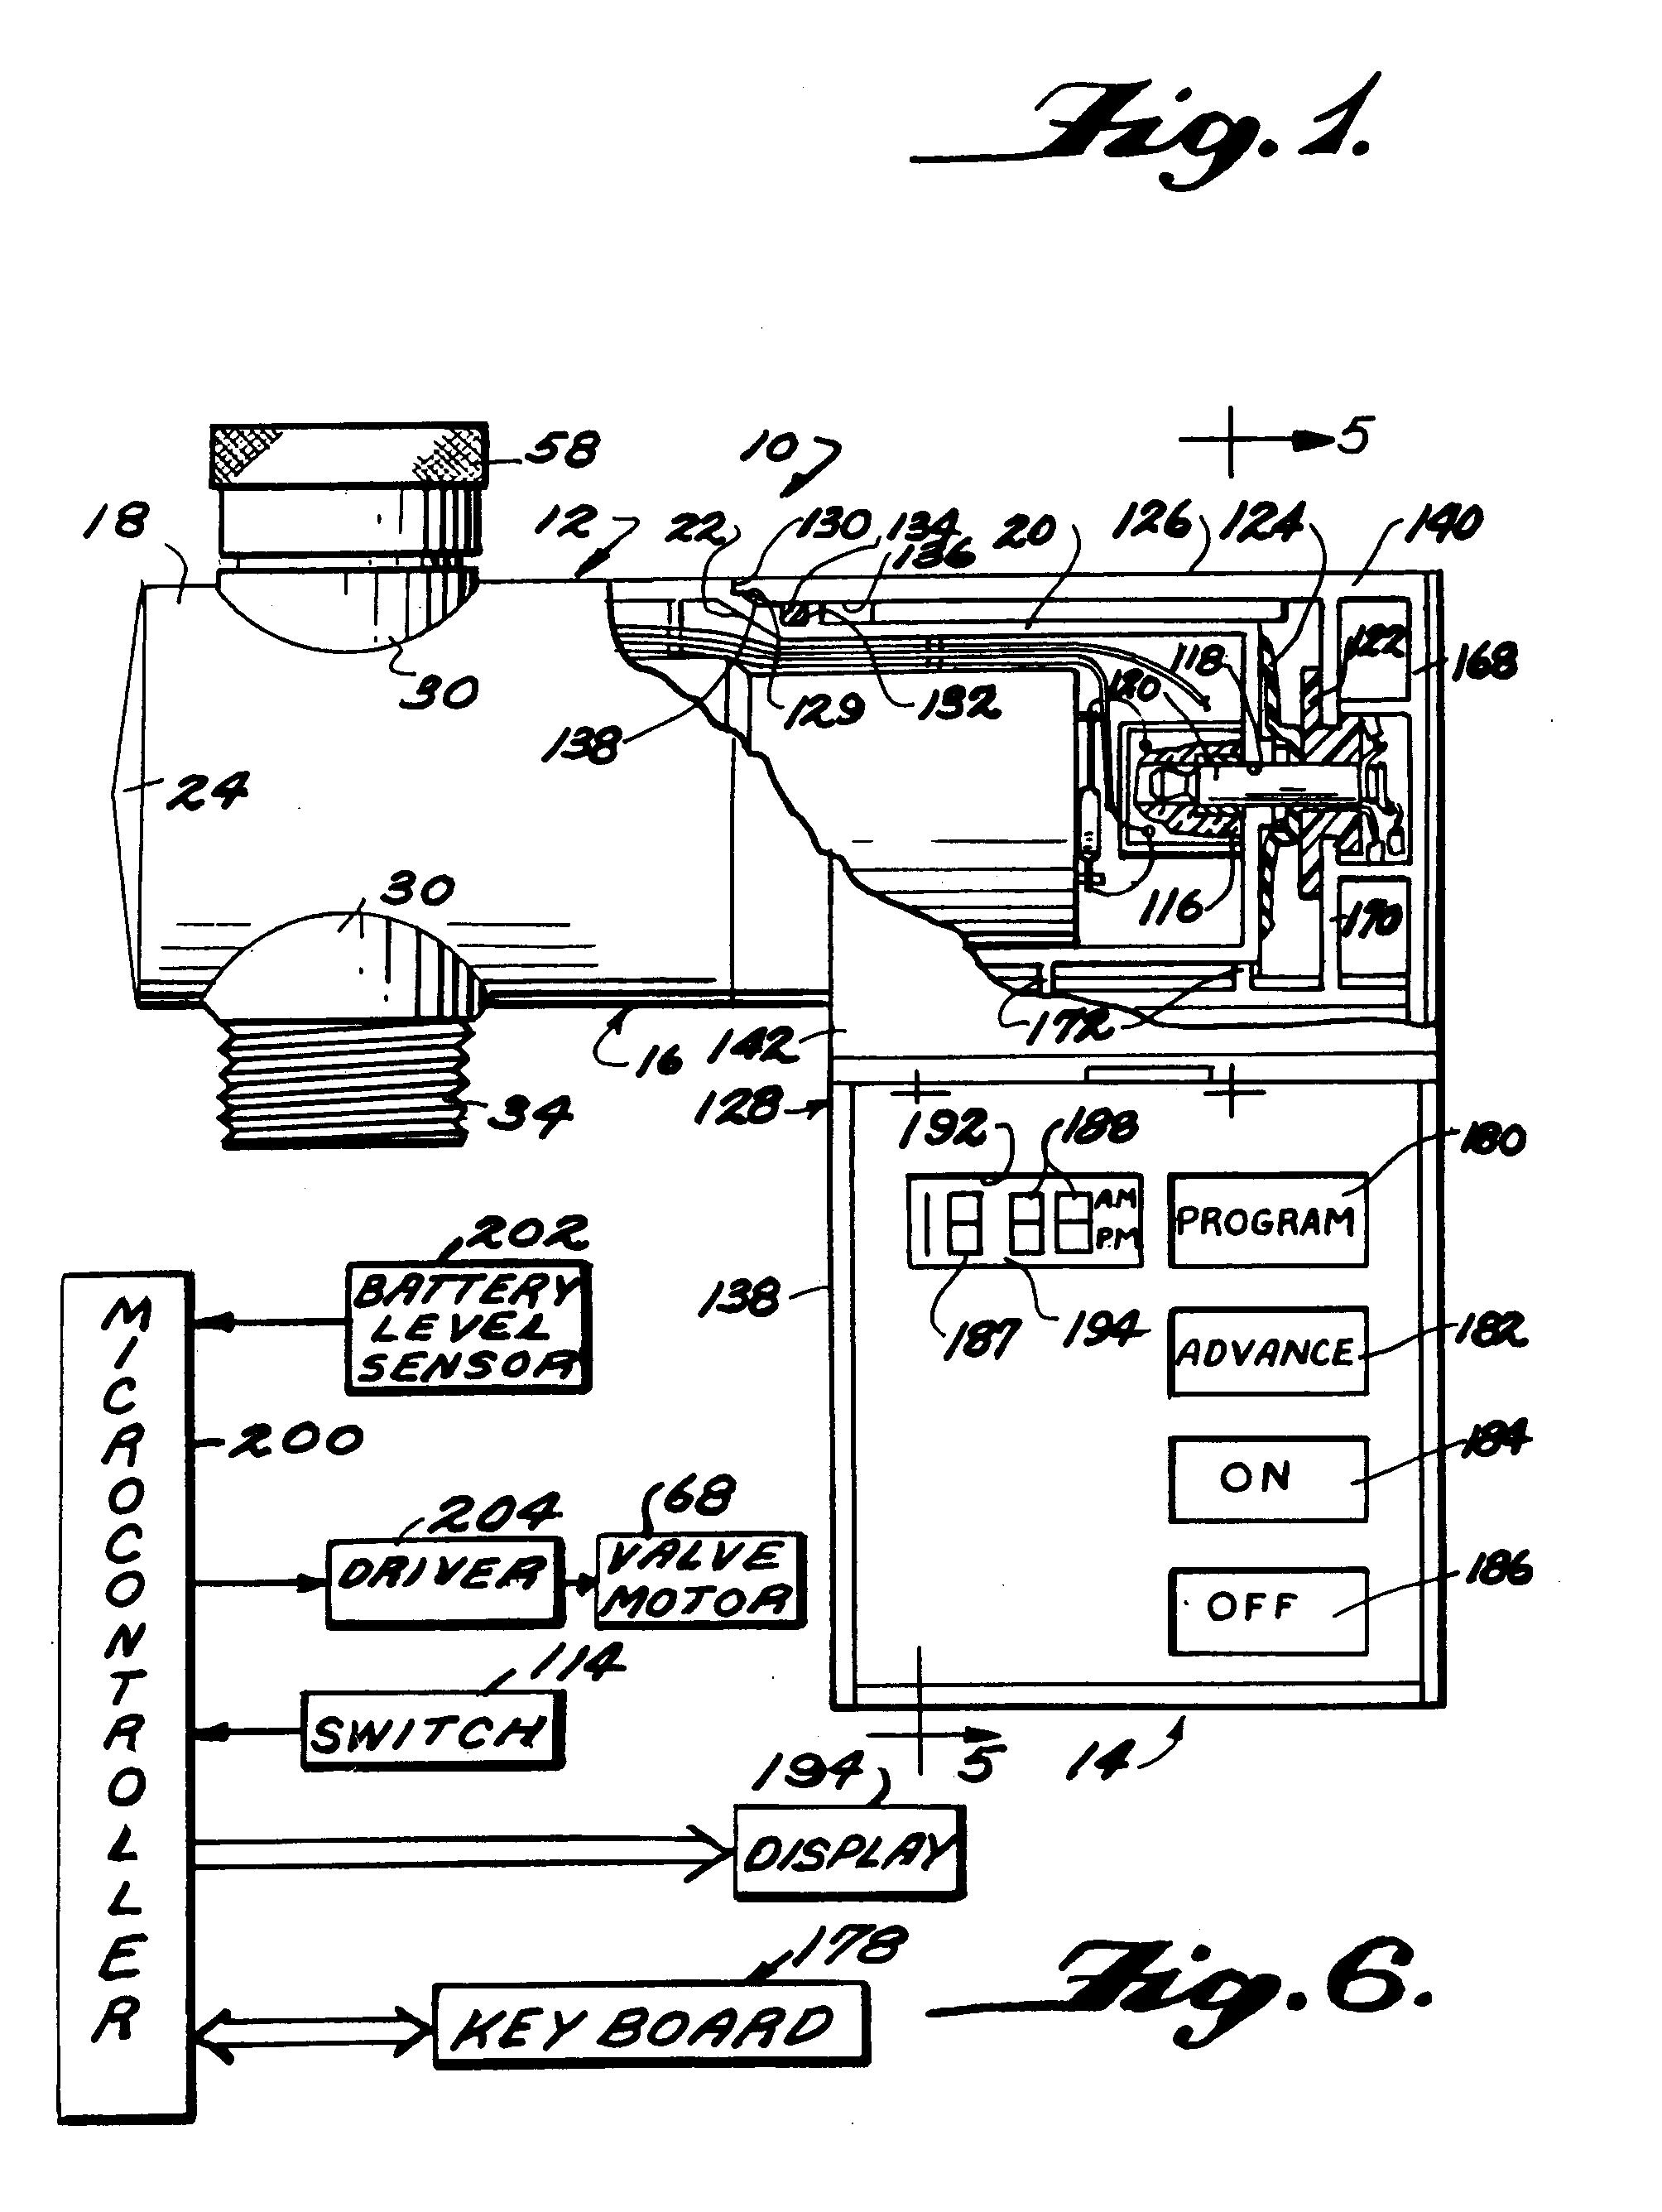 sprinkler valve diagram lawn sprinkler system diagram theamplifierautomatic lawn sprinkler timer diagram free download wiring diagrams